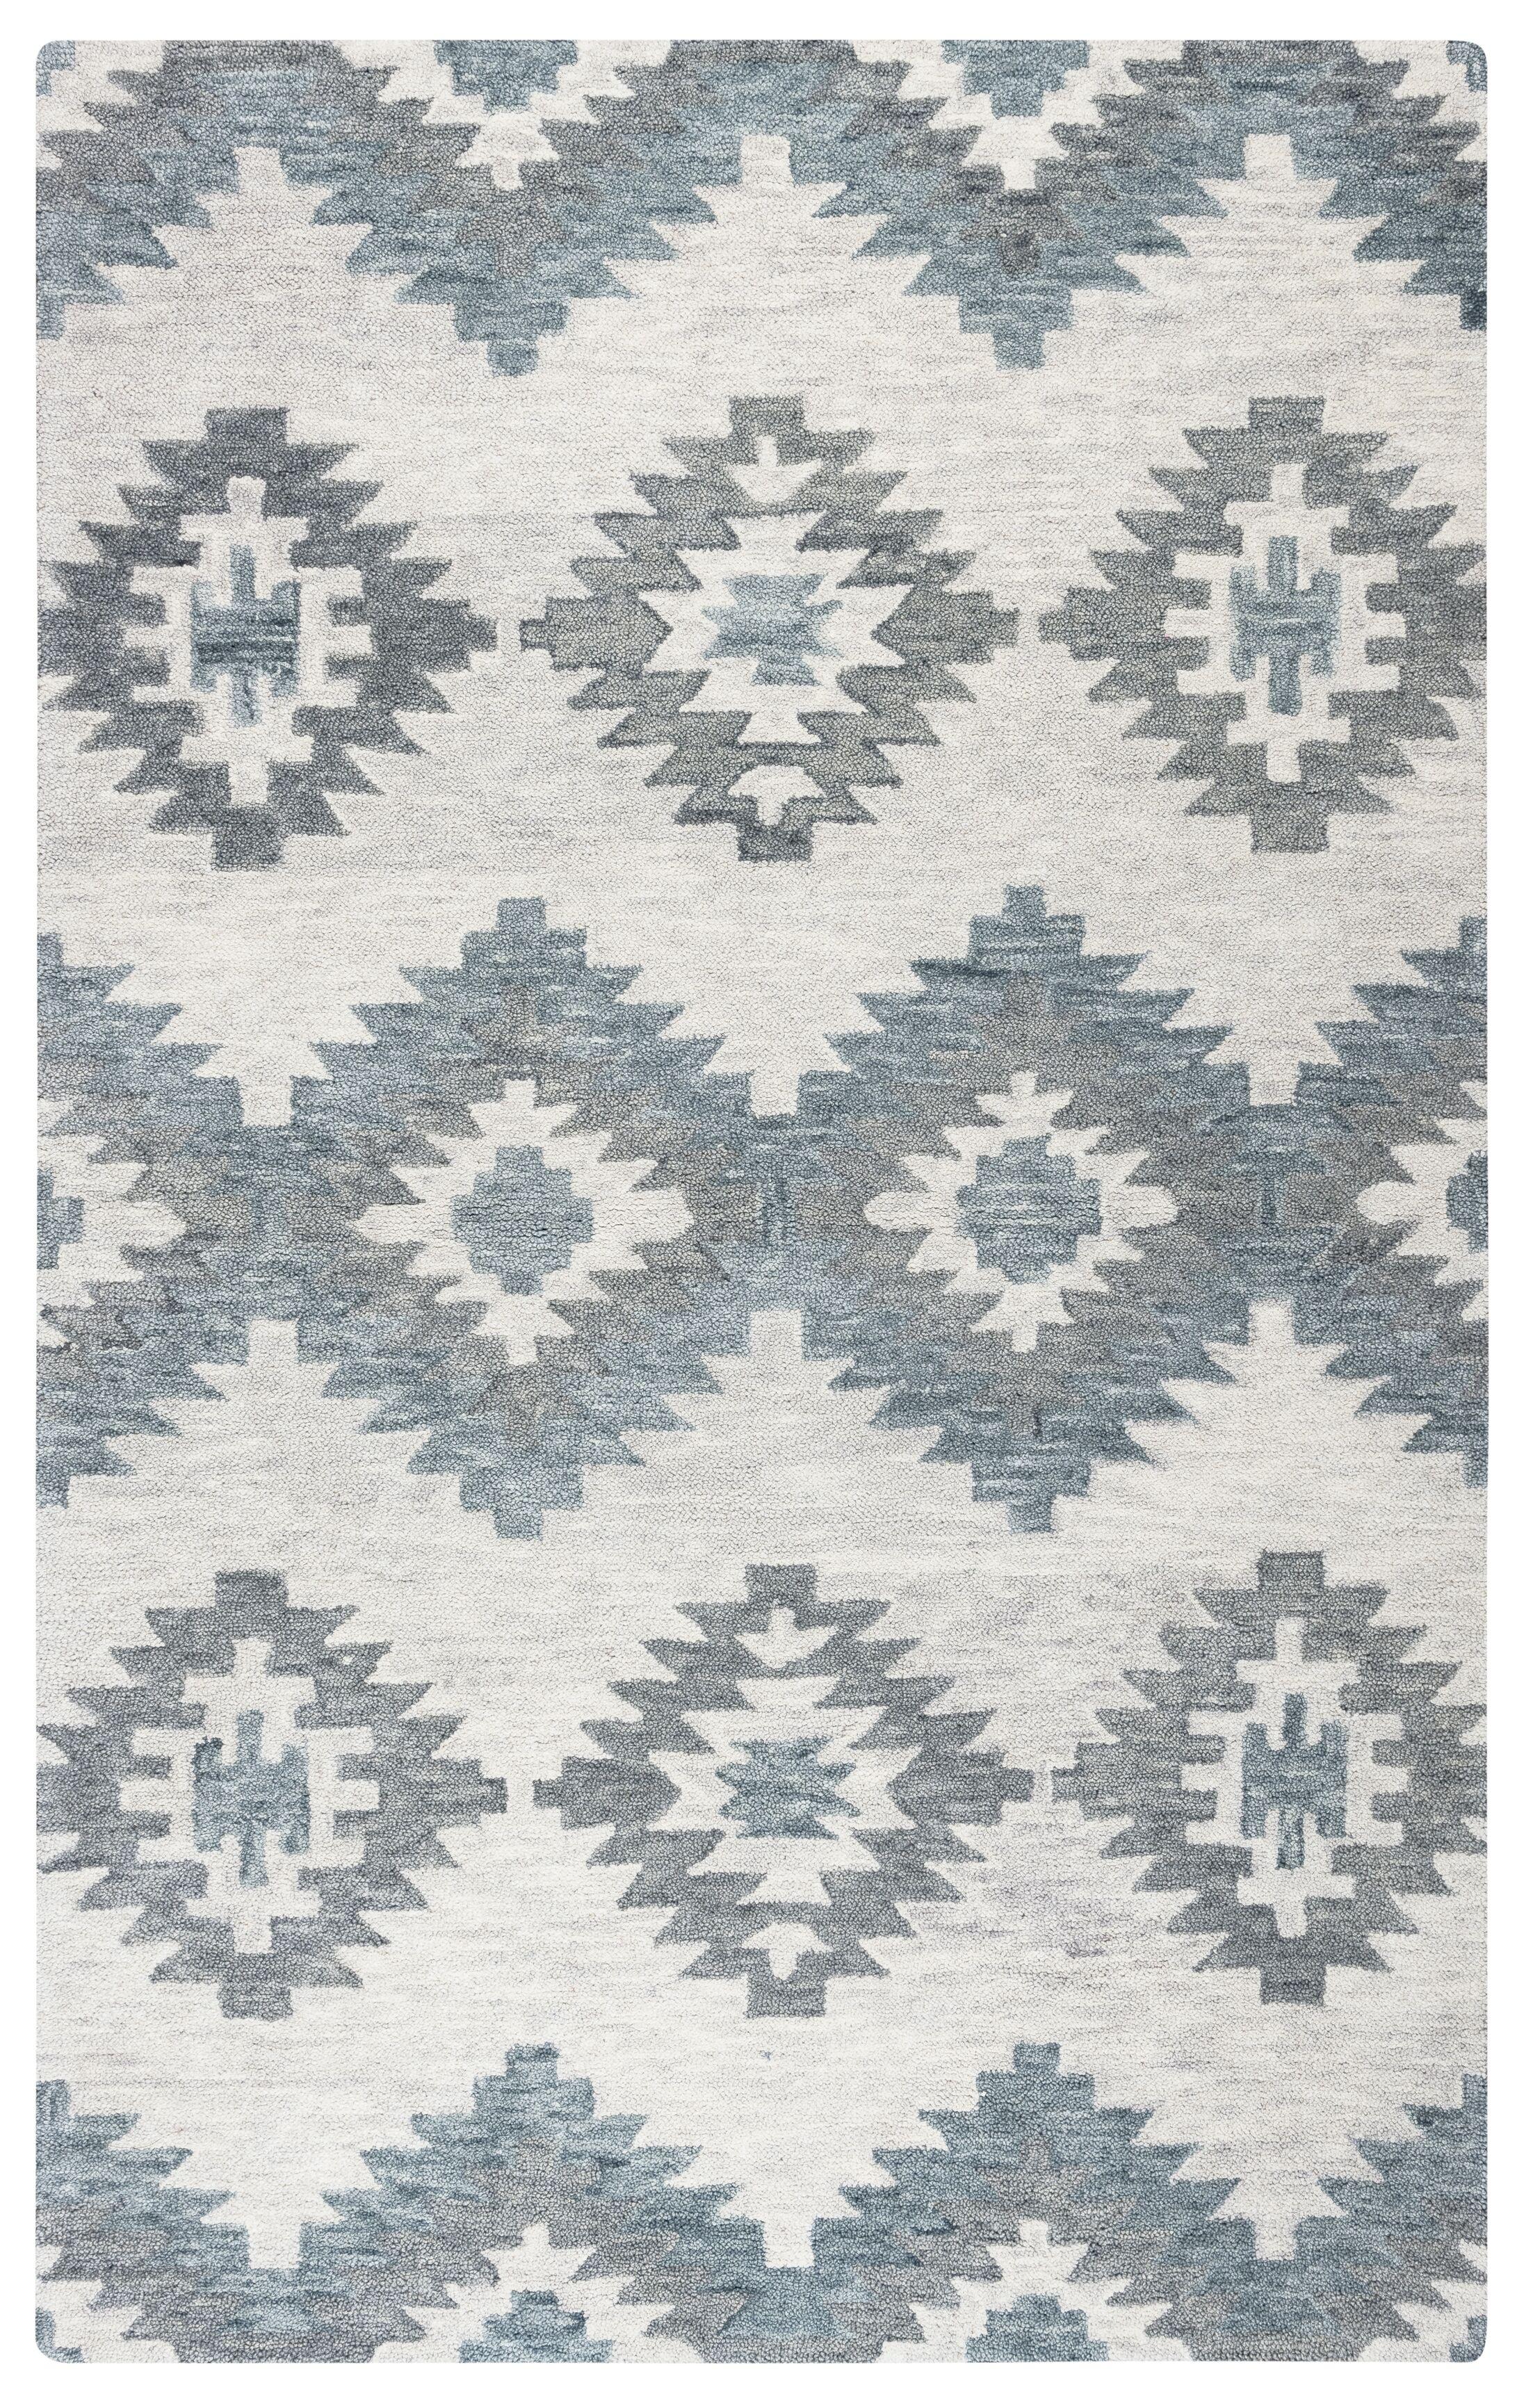 Brandon Gray Hand-Woven Wool Area Rug Rug Size: Rectangle 9' x 12'